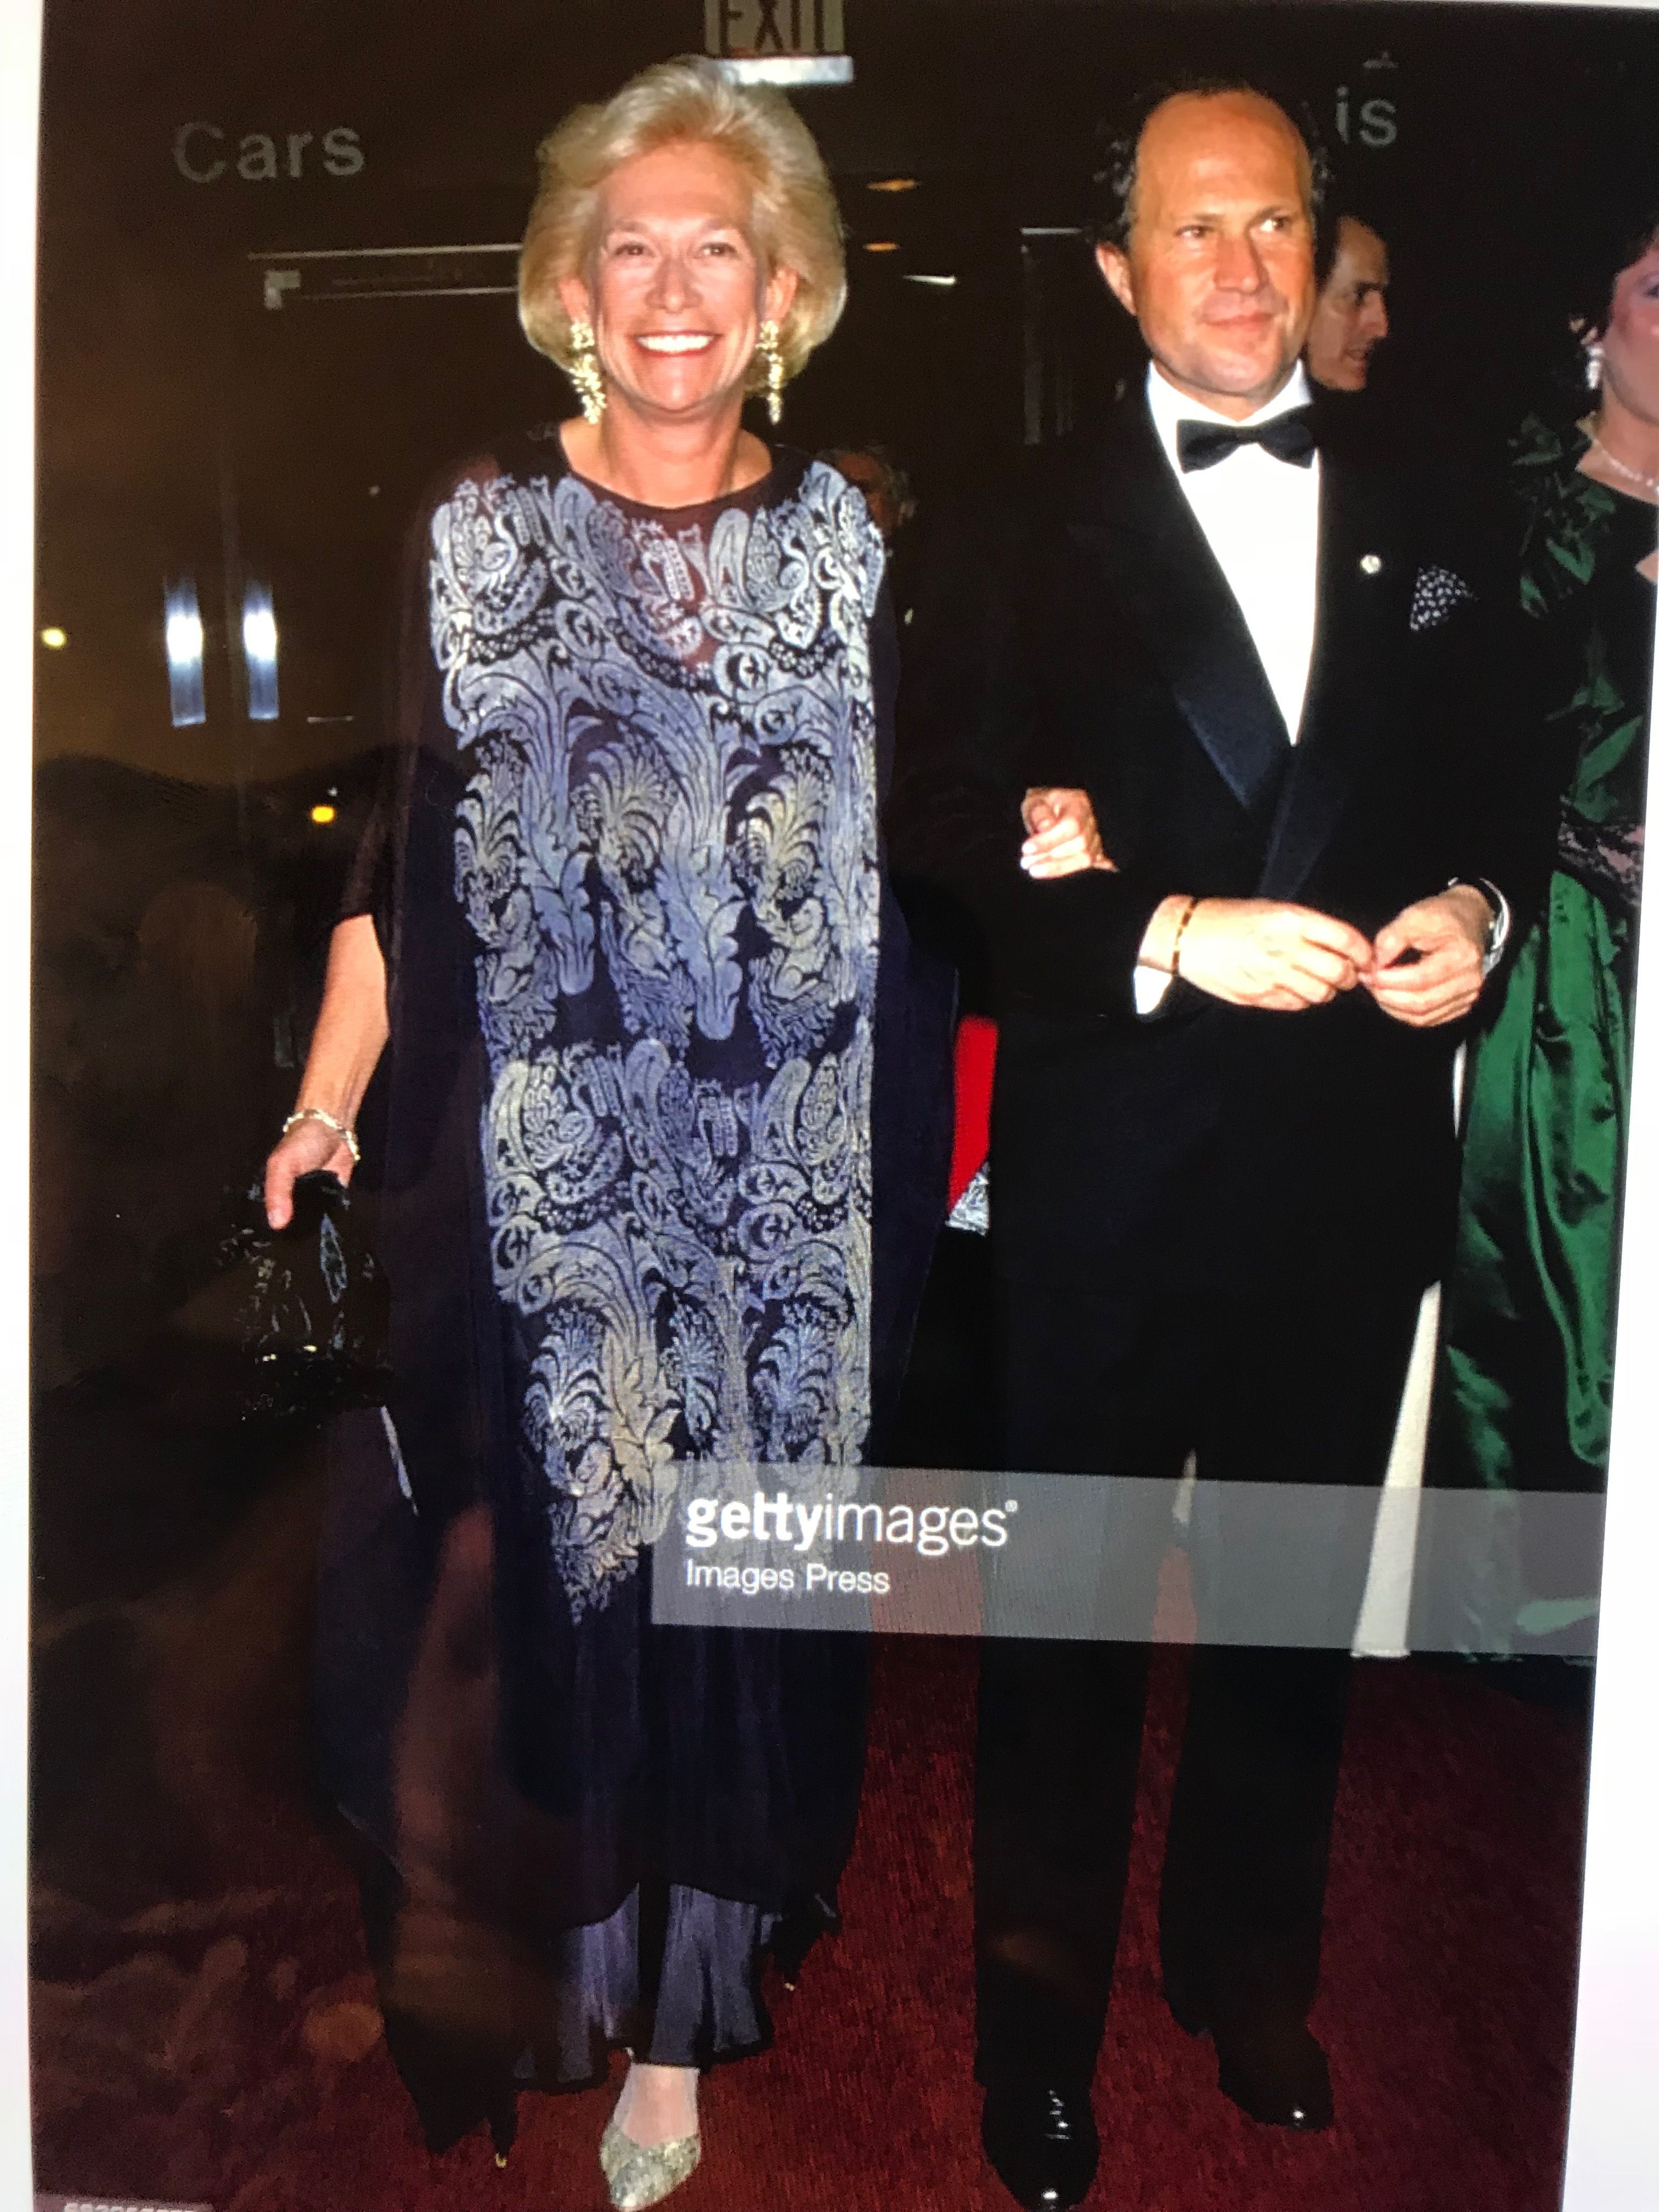 Iris Love and Sergio Valente Mona Italia Gala 1989 (With